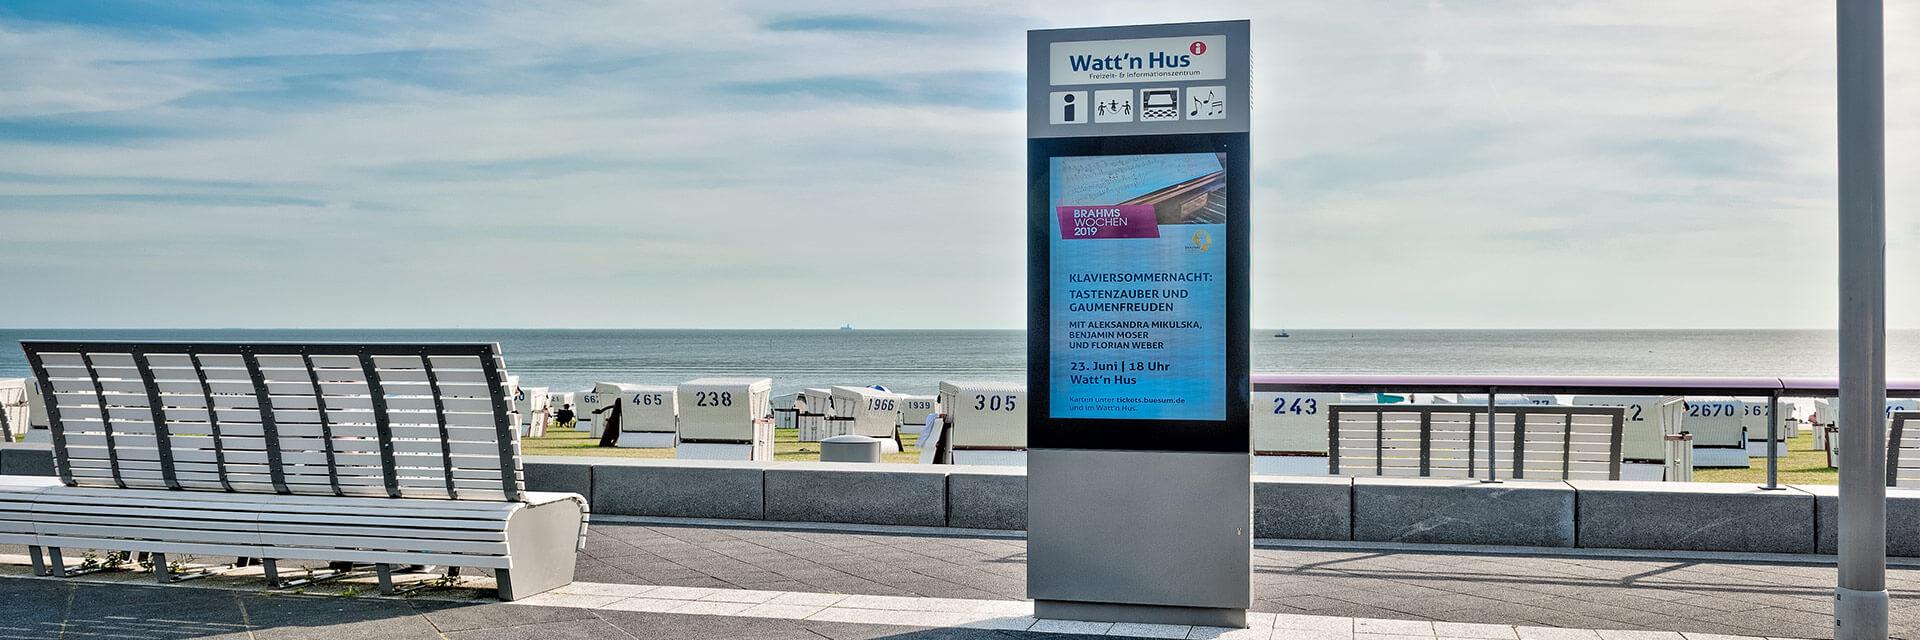 Tourismusmarketing mit Digital Signage in Büsum